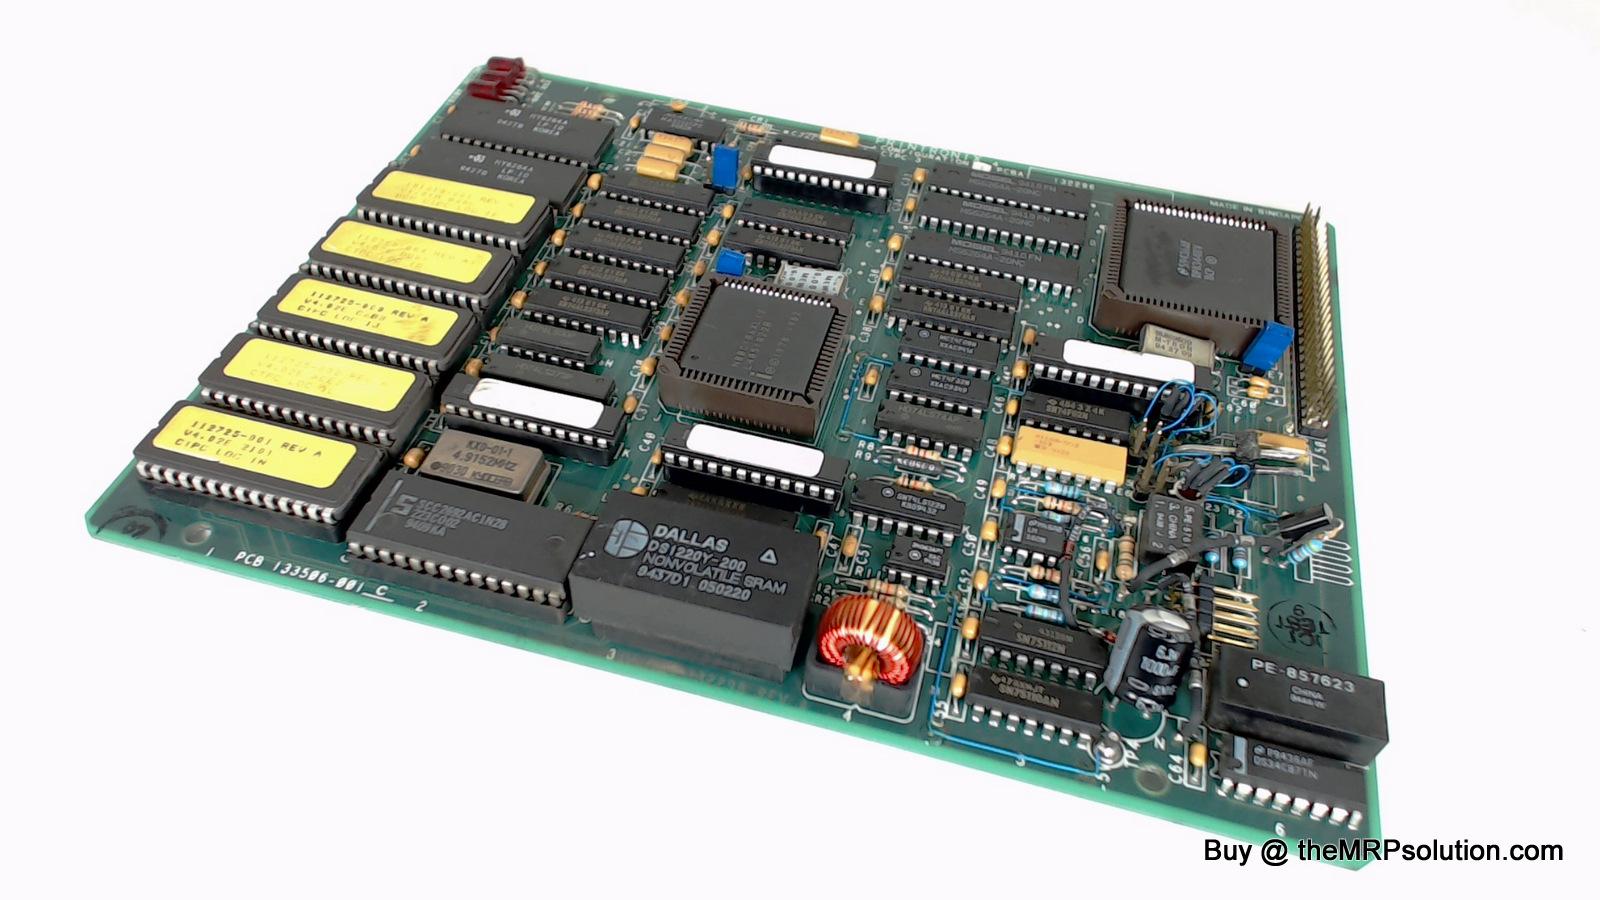 PRINTRONIX 134788-001 CTPC INTERFACE BOARD, P4280 Refurbished